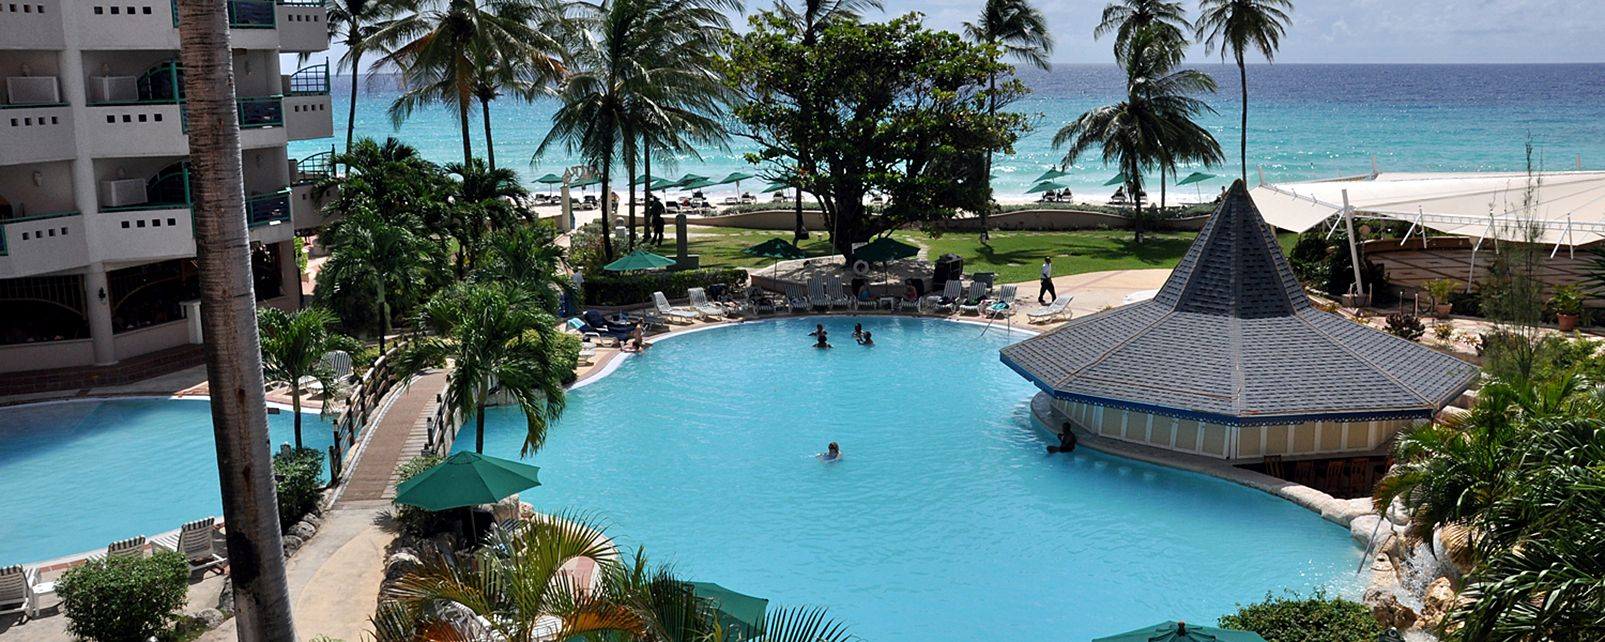 Hotel Accra Beach